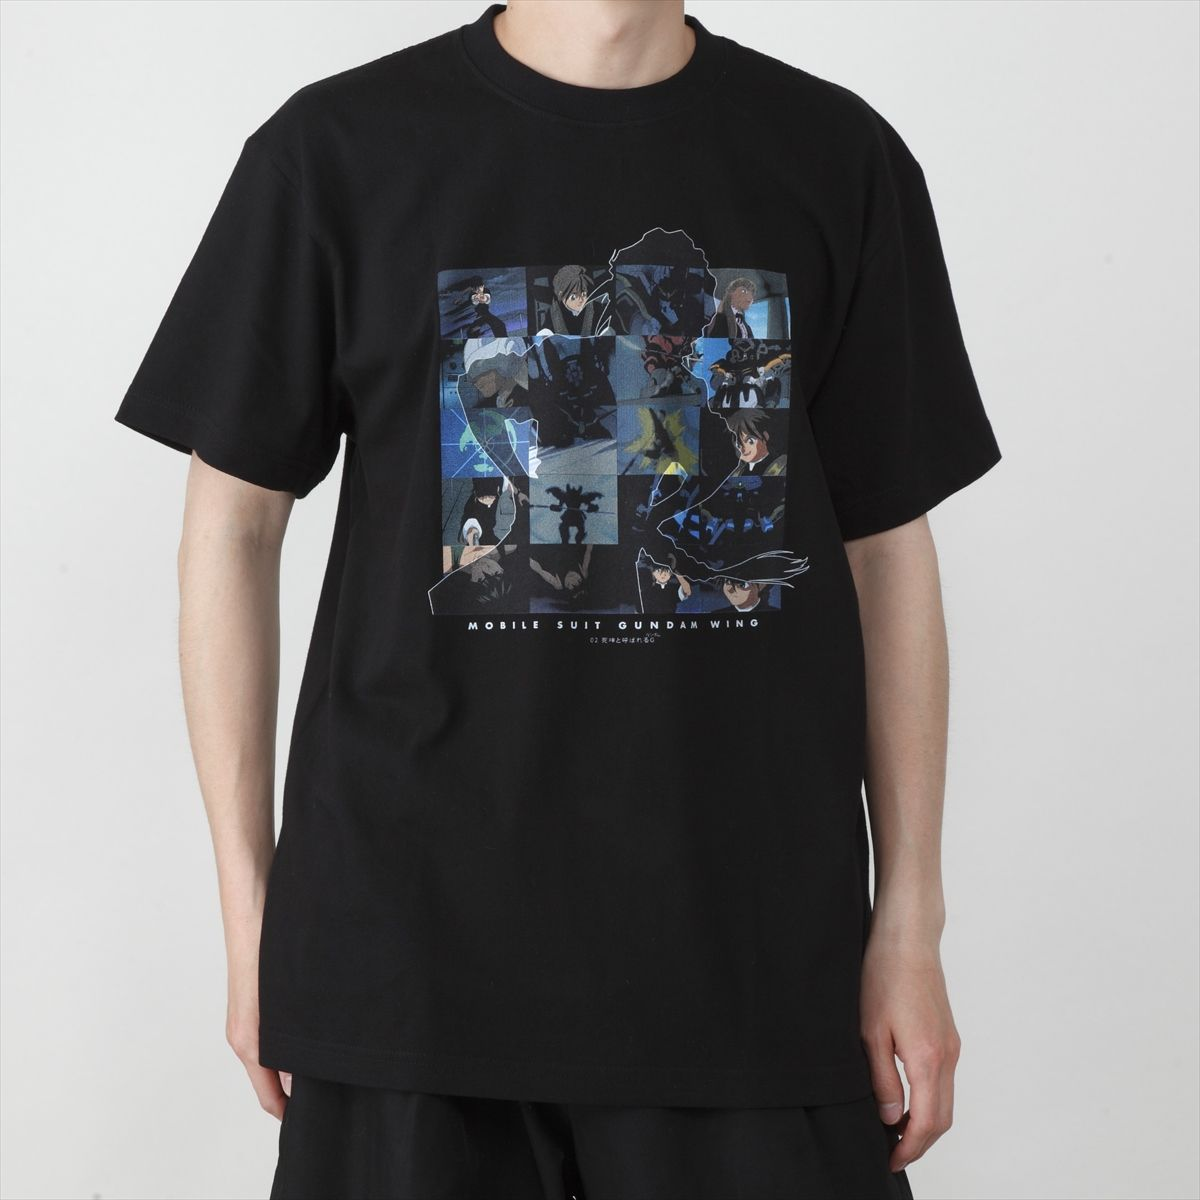 The Gundam Deathscythe T-shirt—Mobile Suit Gundam Wing